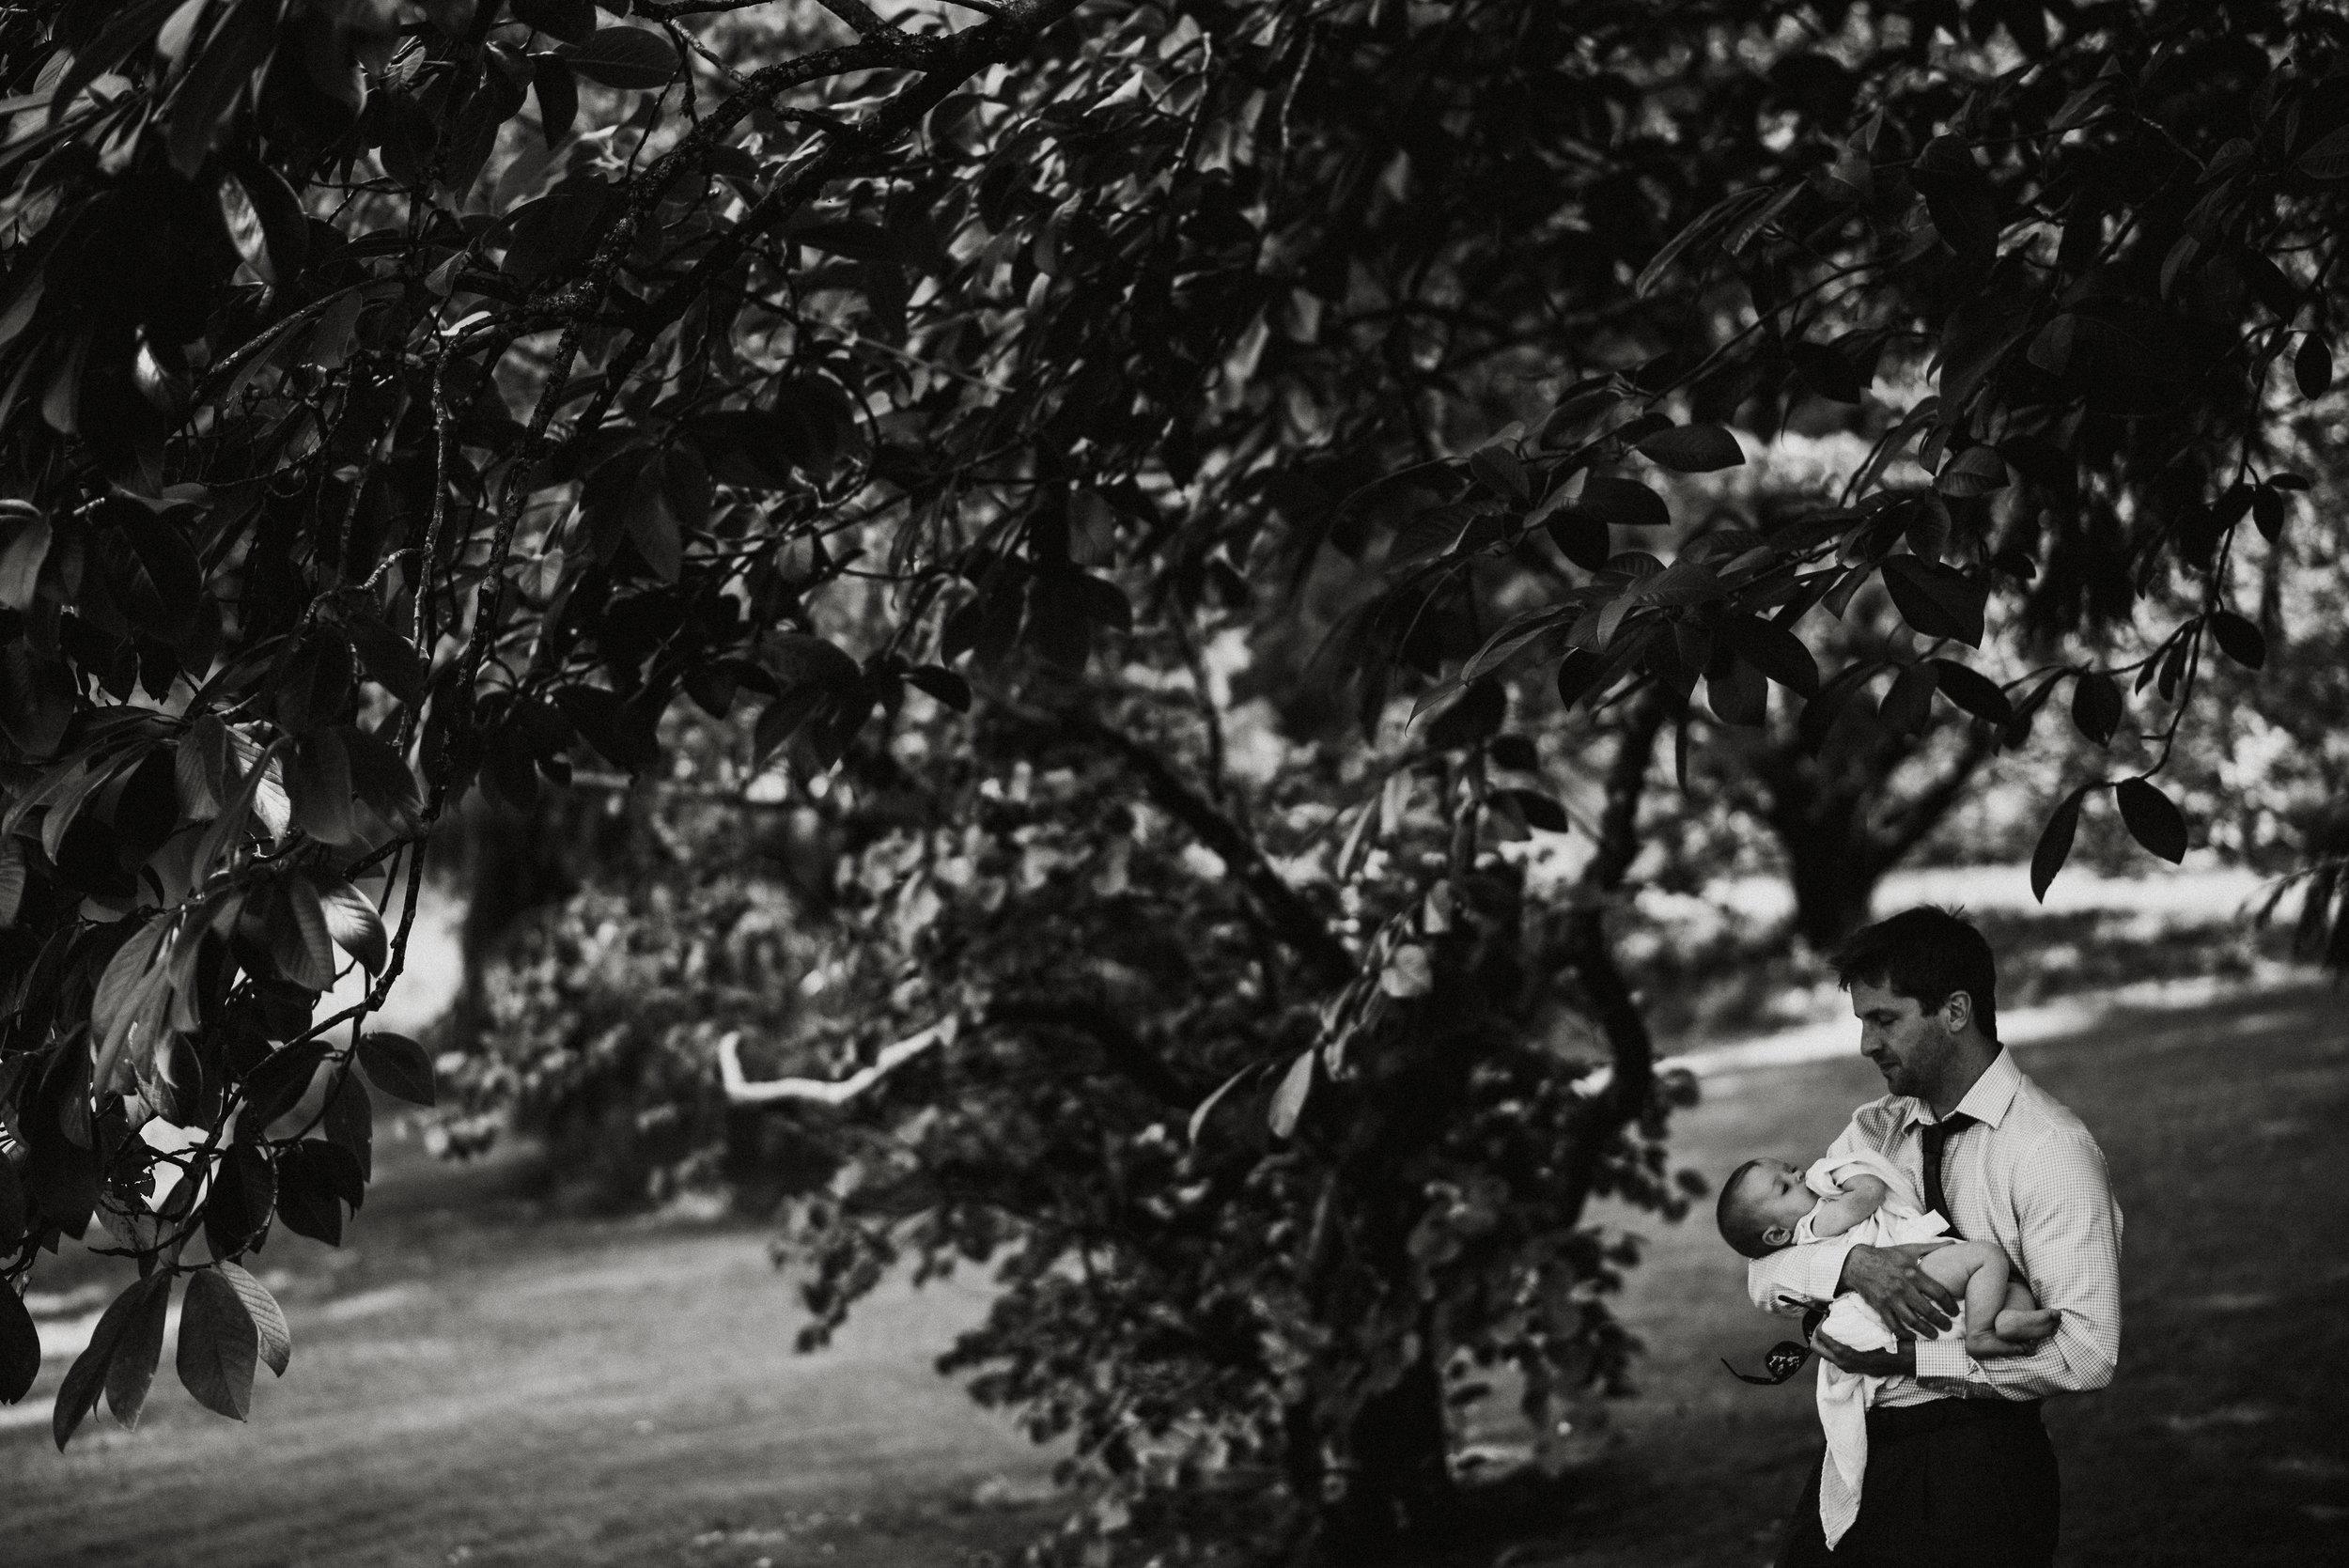 pencarrow-house-wedding-photographer-59.jpg